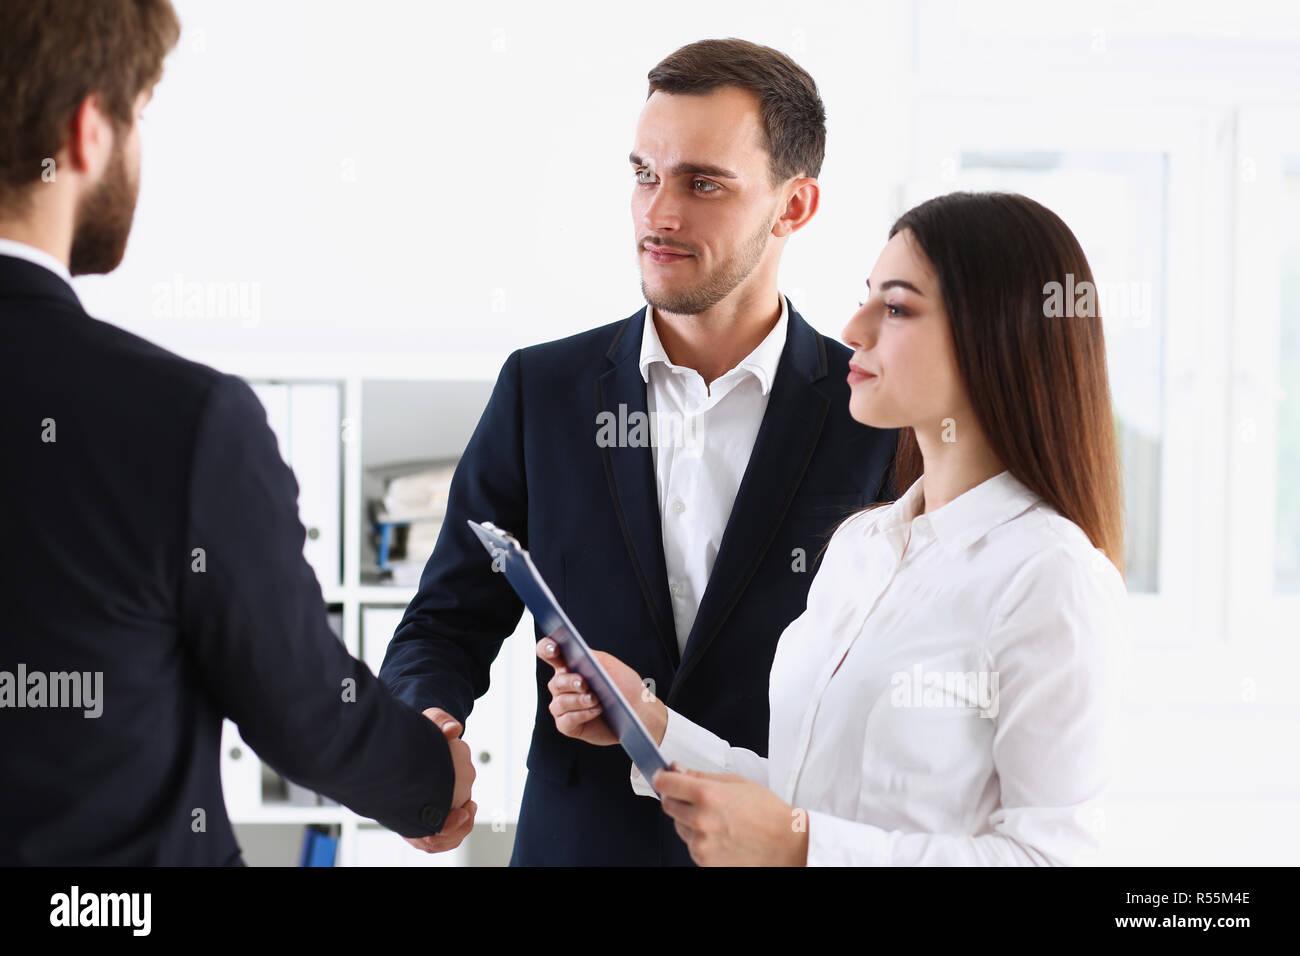 Escort service interpreter works with transaction - Stock Image